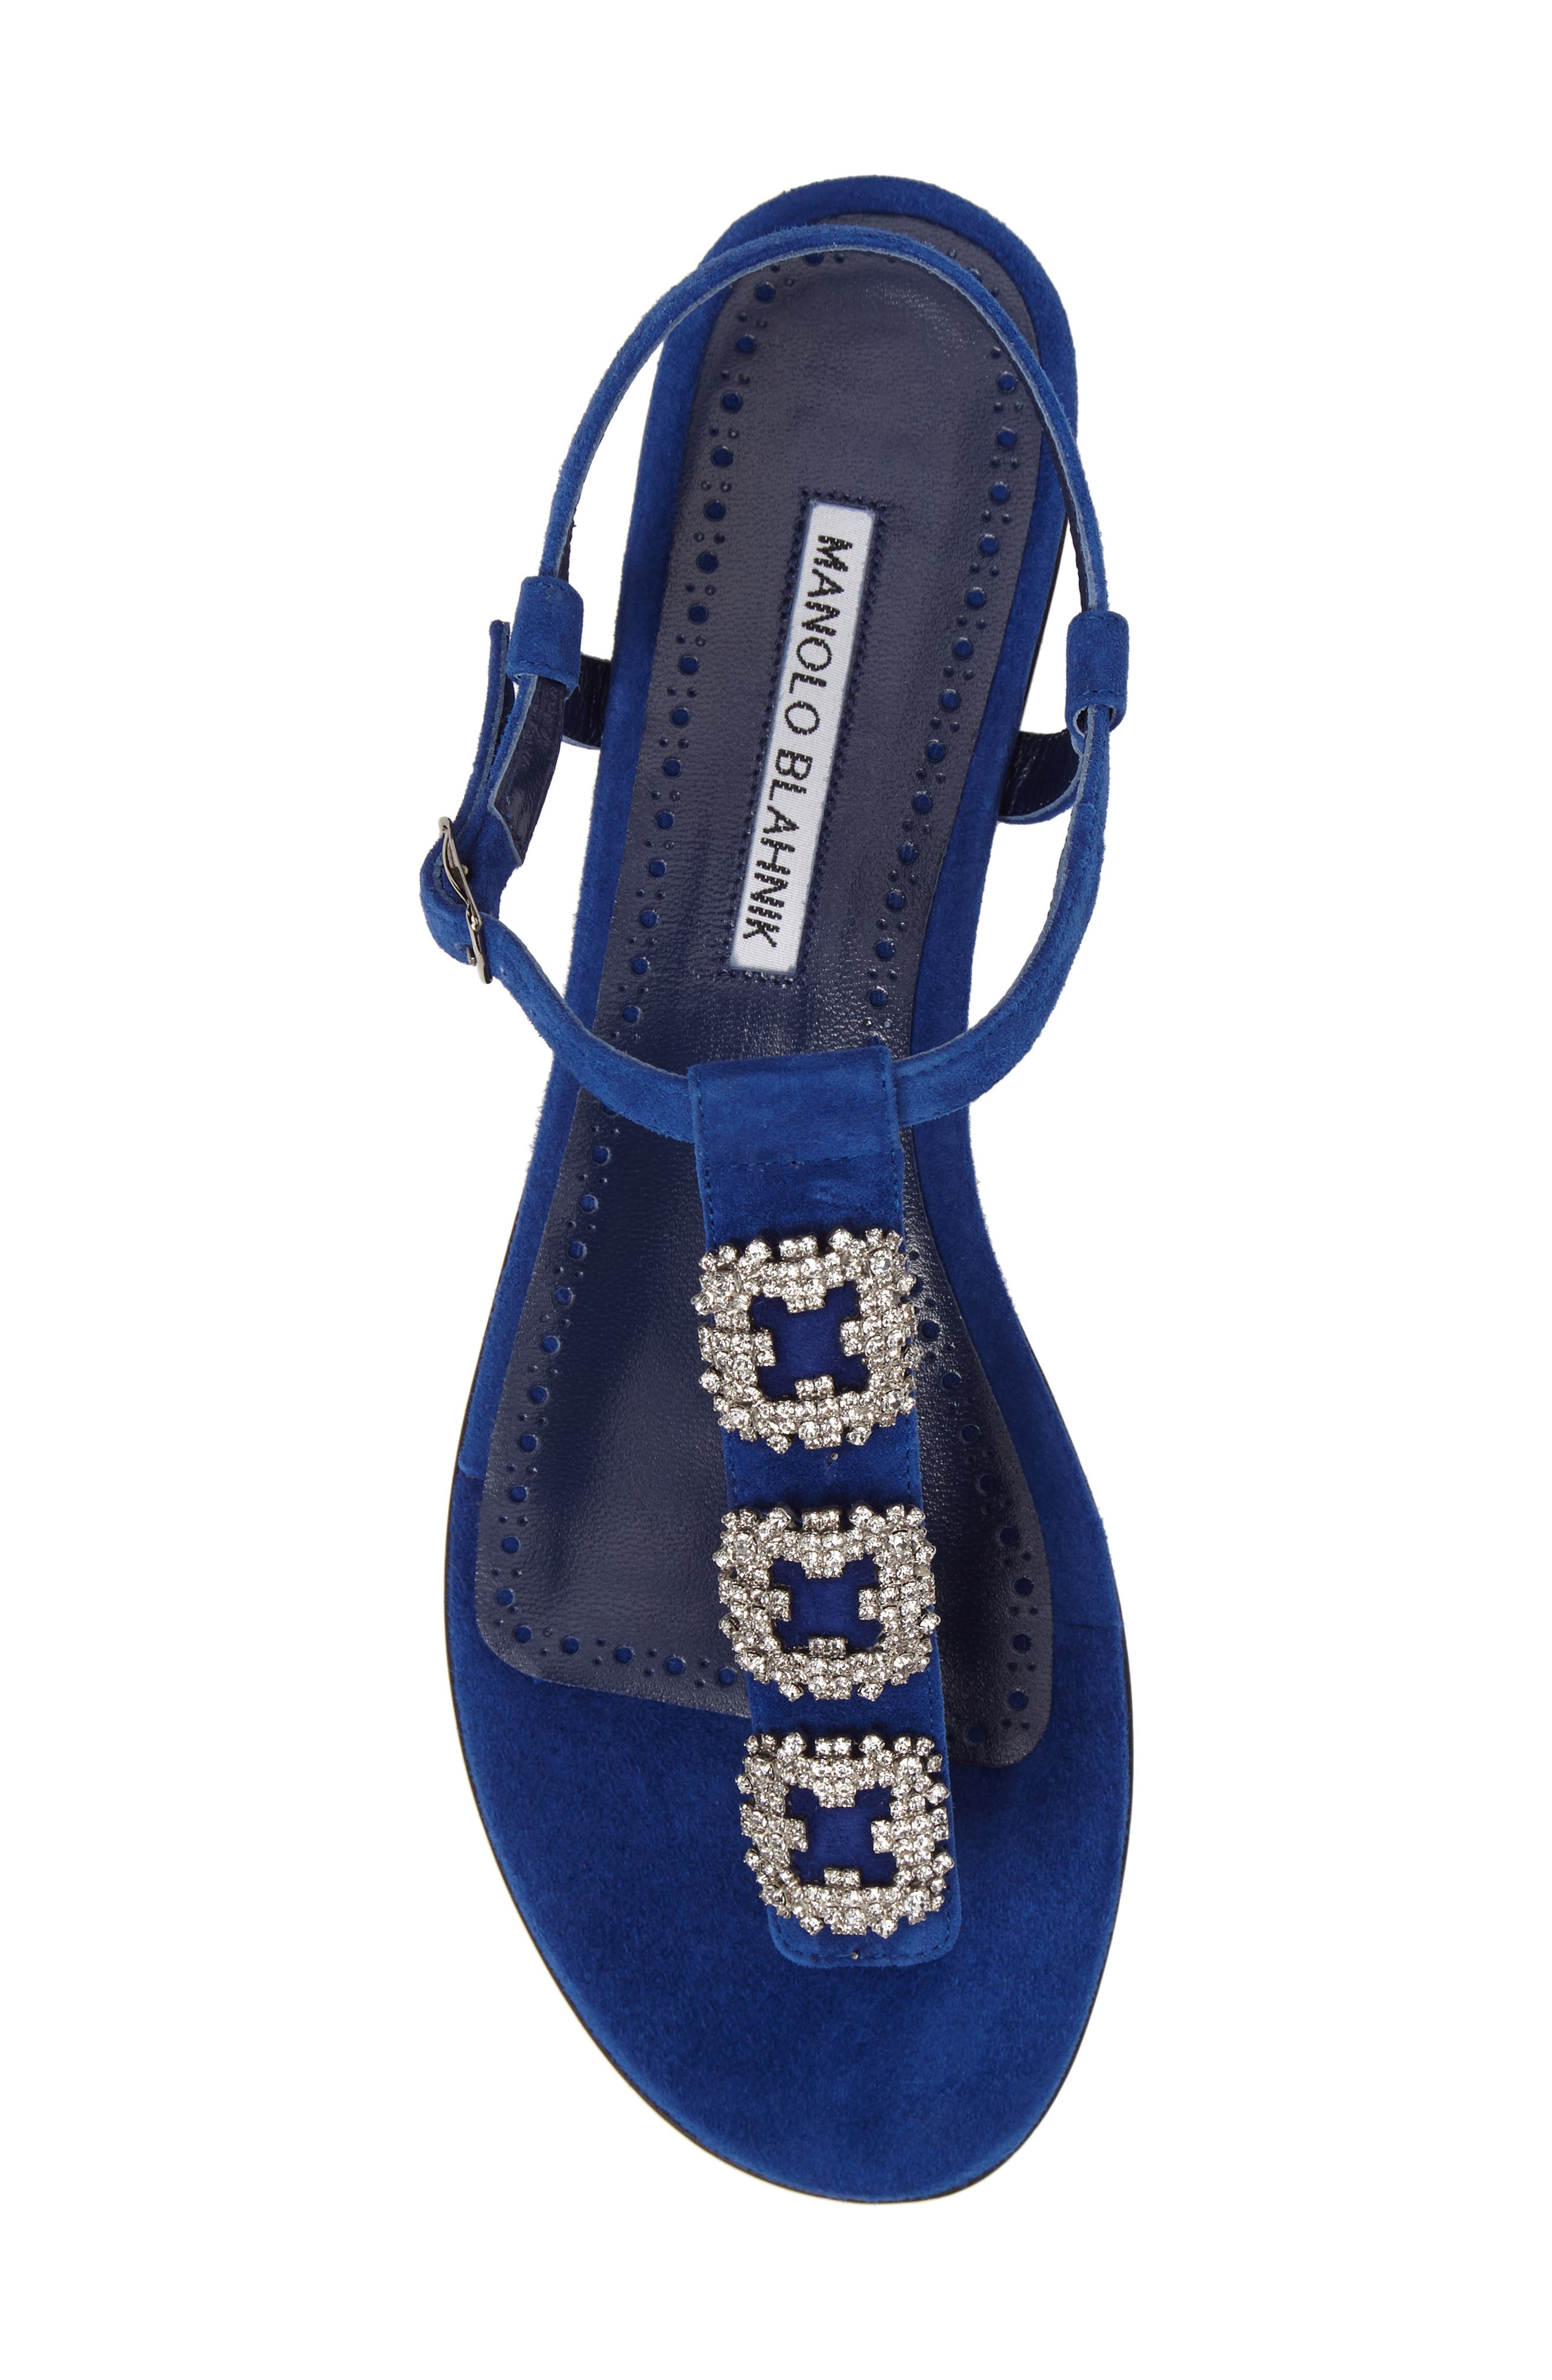 Ottolina T-Strap Sandal,                             Alternate thumbnail 5, color,                             Blue Suede